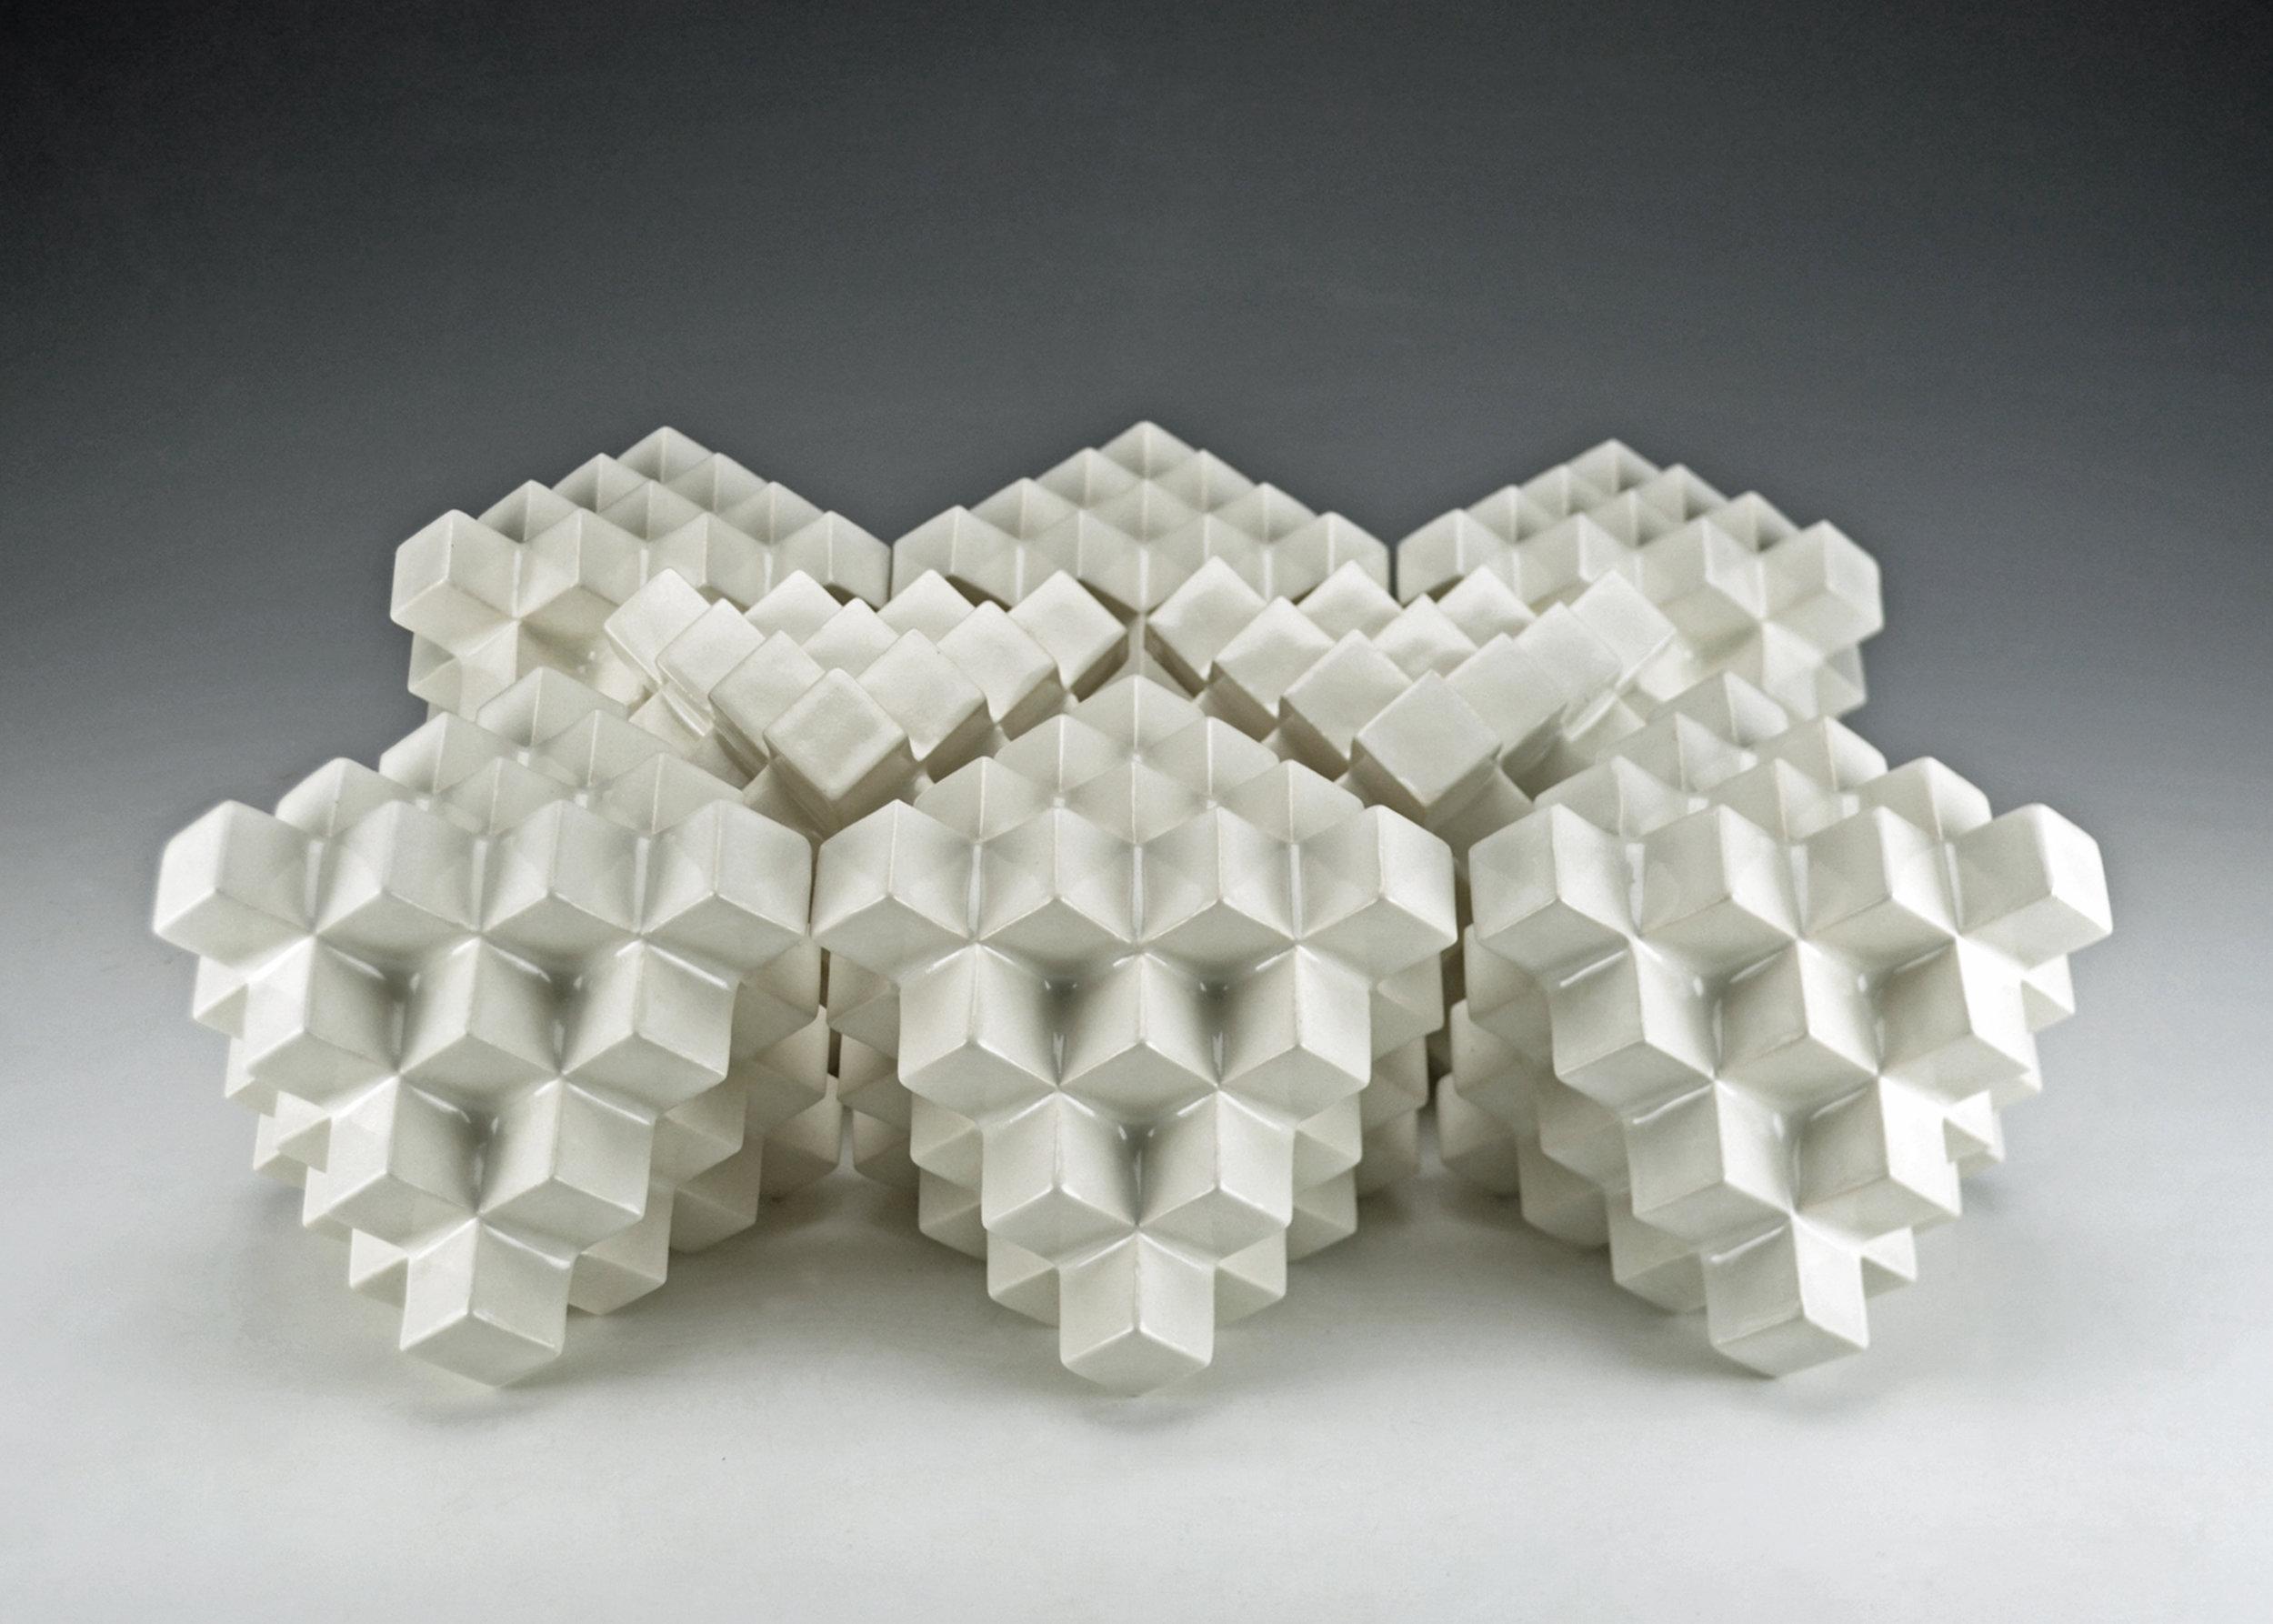 Cubic Series: Octahedrons  |  Each: 5 x 5 x 5 inches  |  Porcelain, Glaze  |  2017